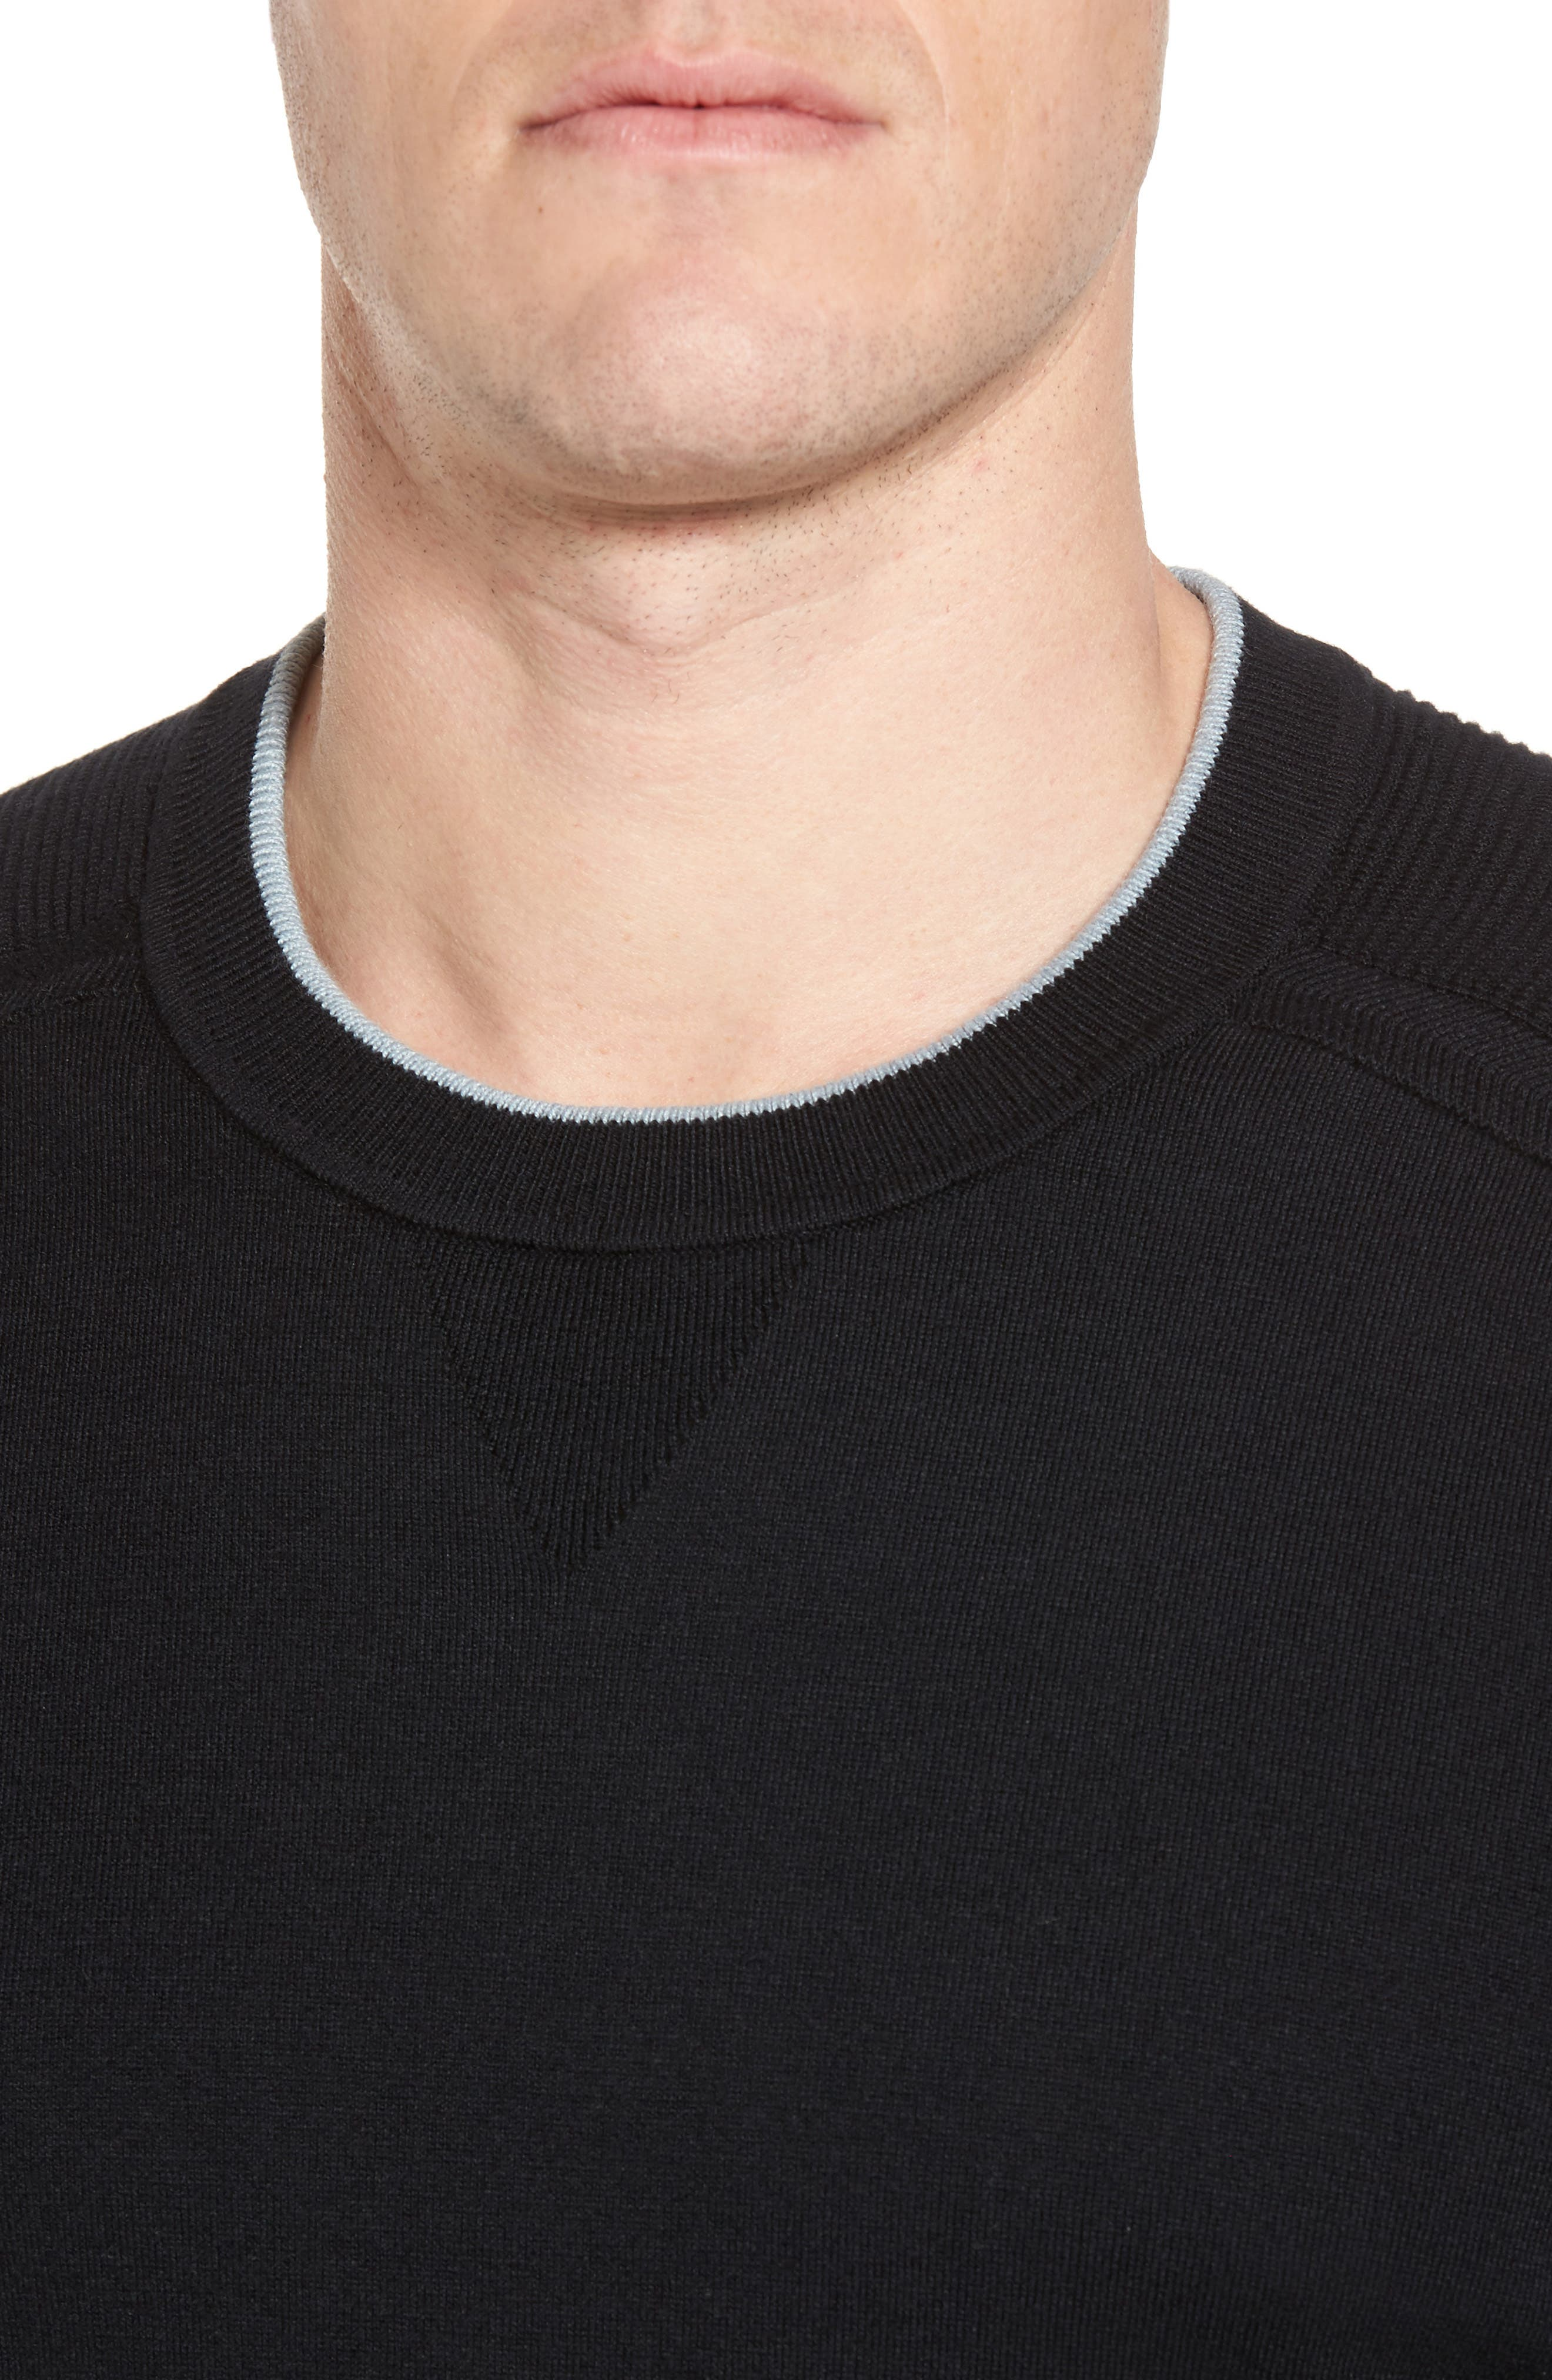 Kayfed Rib Sleeve Sweater,                             Alternate thumbnail 4, color,                             001